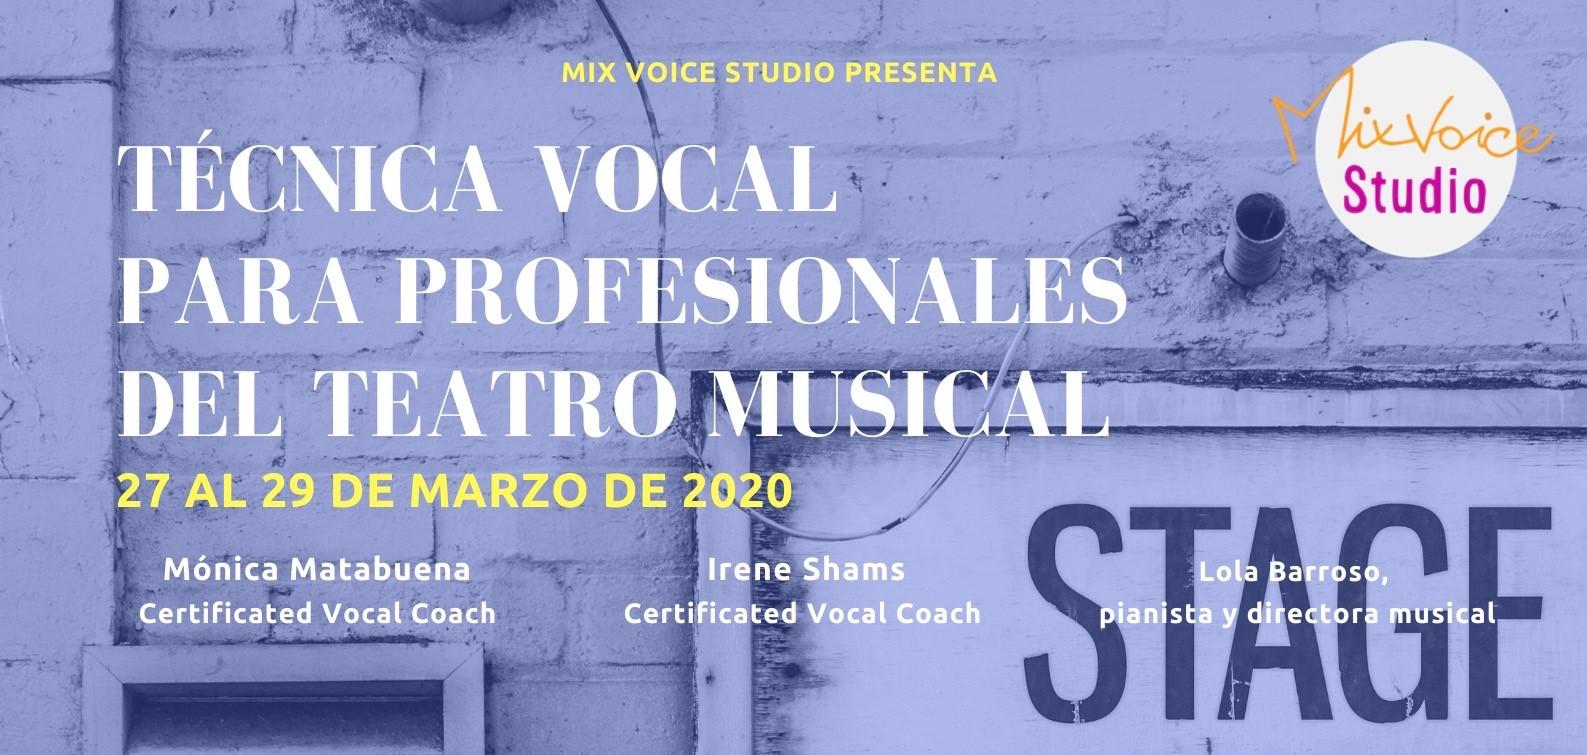 Curso de Técnica Vocal para profesionales del teatro musical